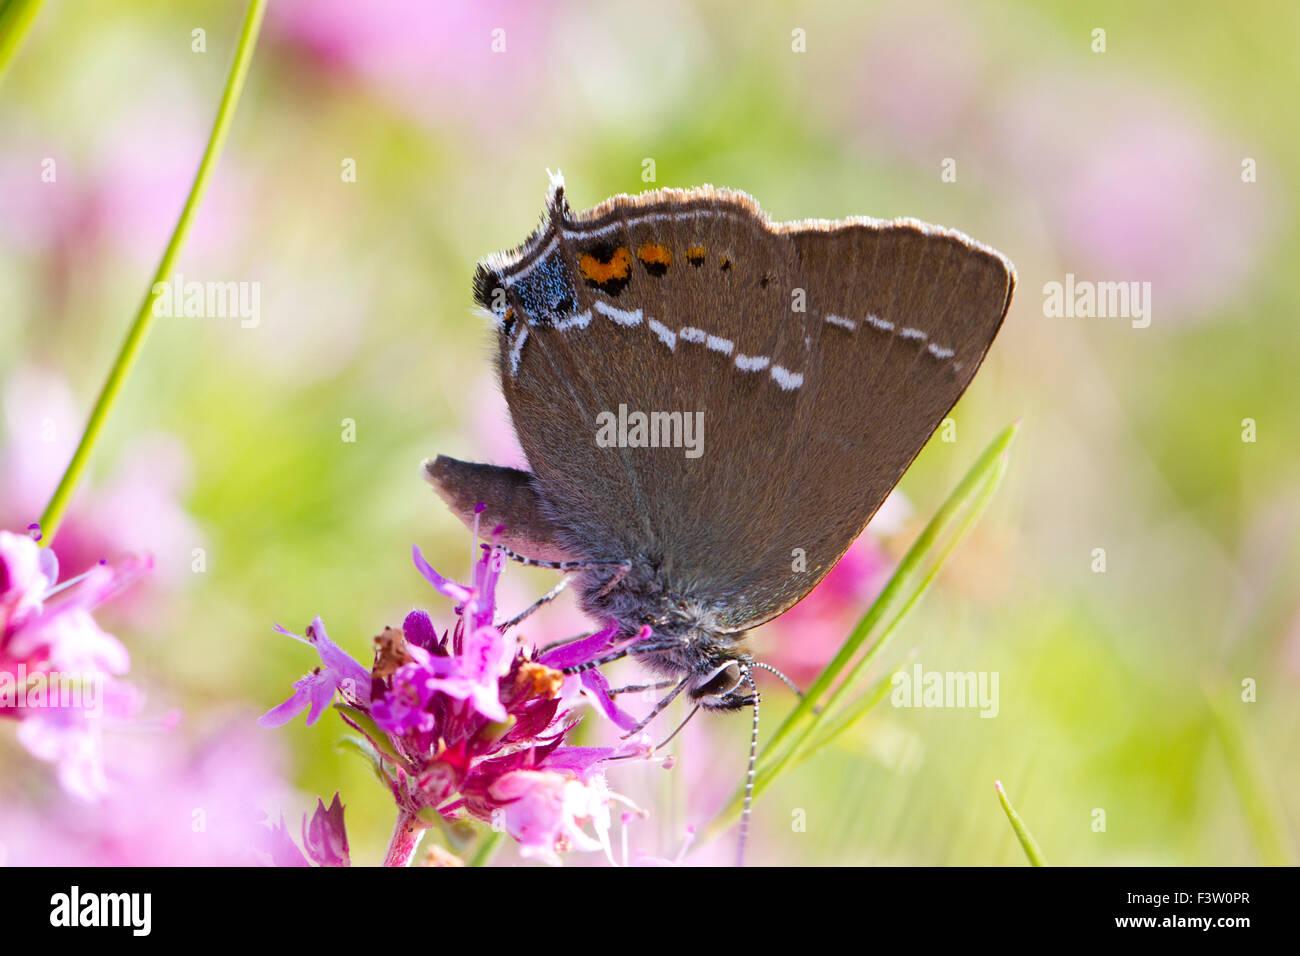 Blue-spot Hairstreak (Satyrium spini) adult butterfly feeding on Thyme (Thymus sp.) flowers. Causse de Gramat, France. - Stock Image